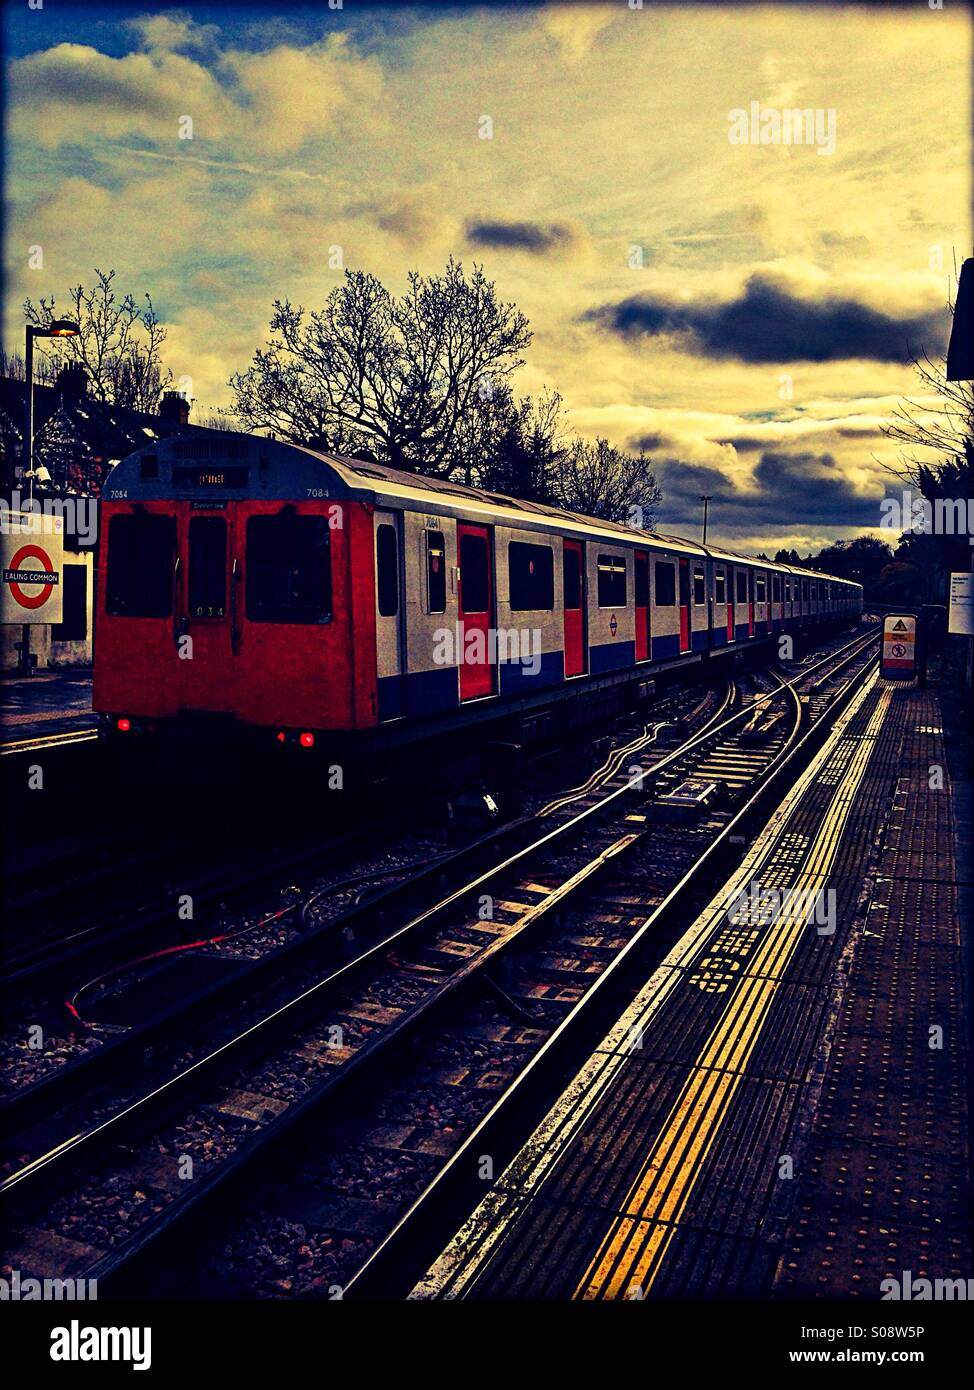 Tube train at Ealing Common, London, UK Stock Photo